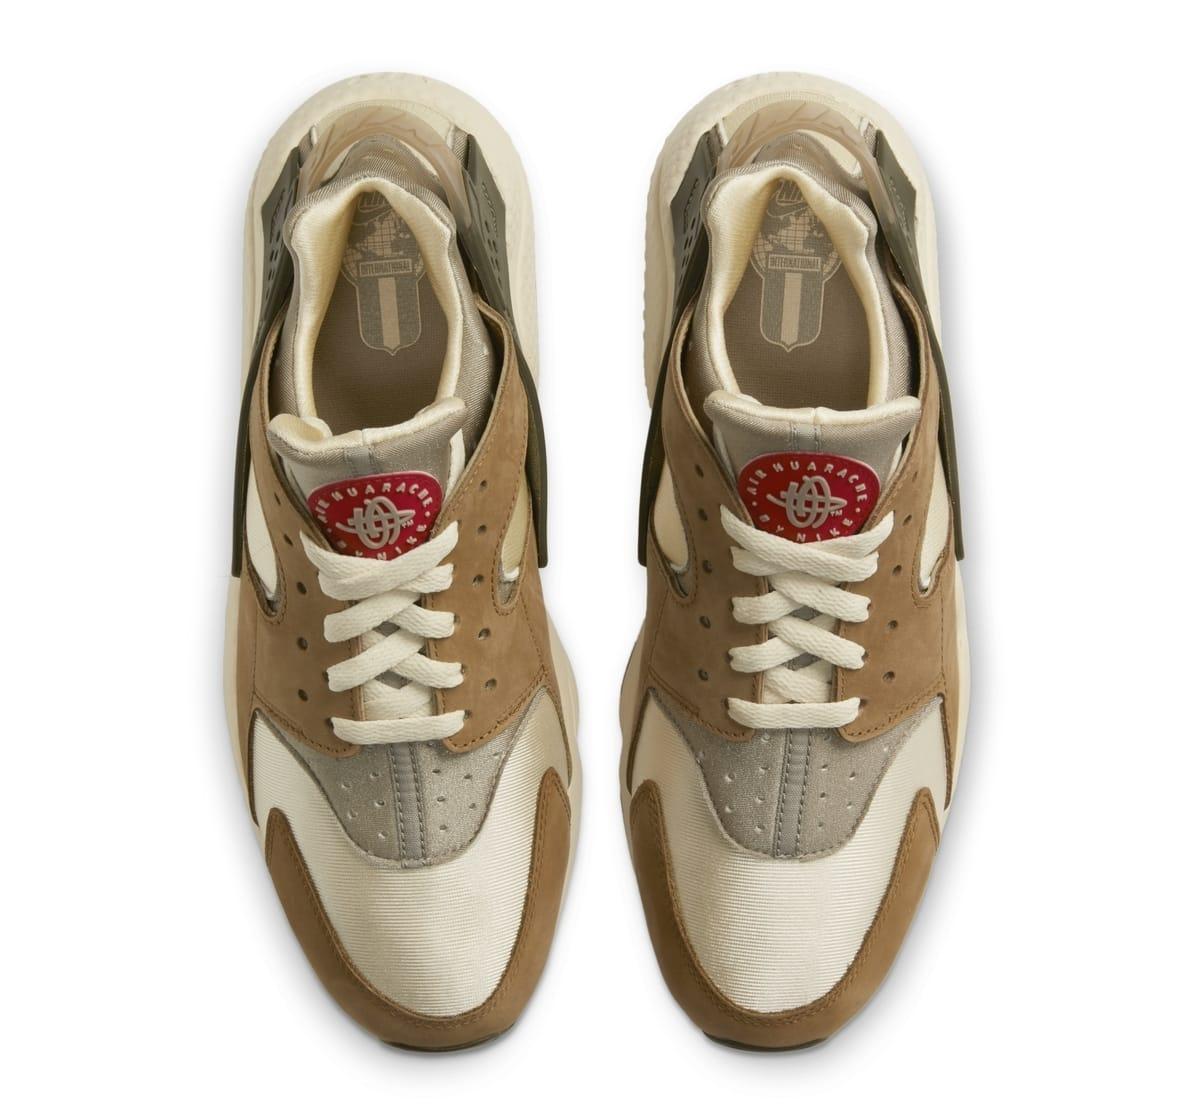 Stussy x Nike Air Huarache 'Desert Oak/Reed/Light Straw' DD1381-200 (Top)